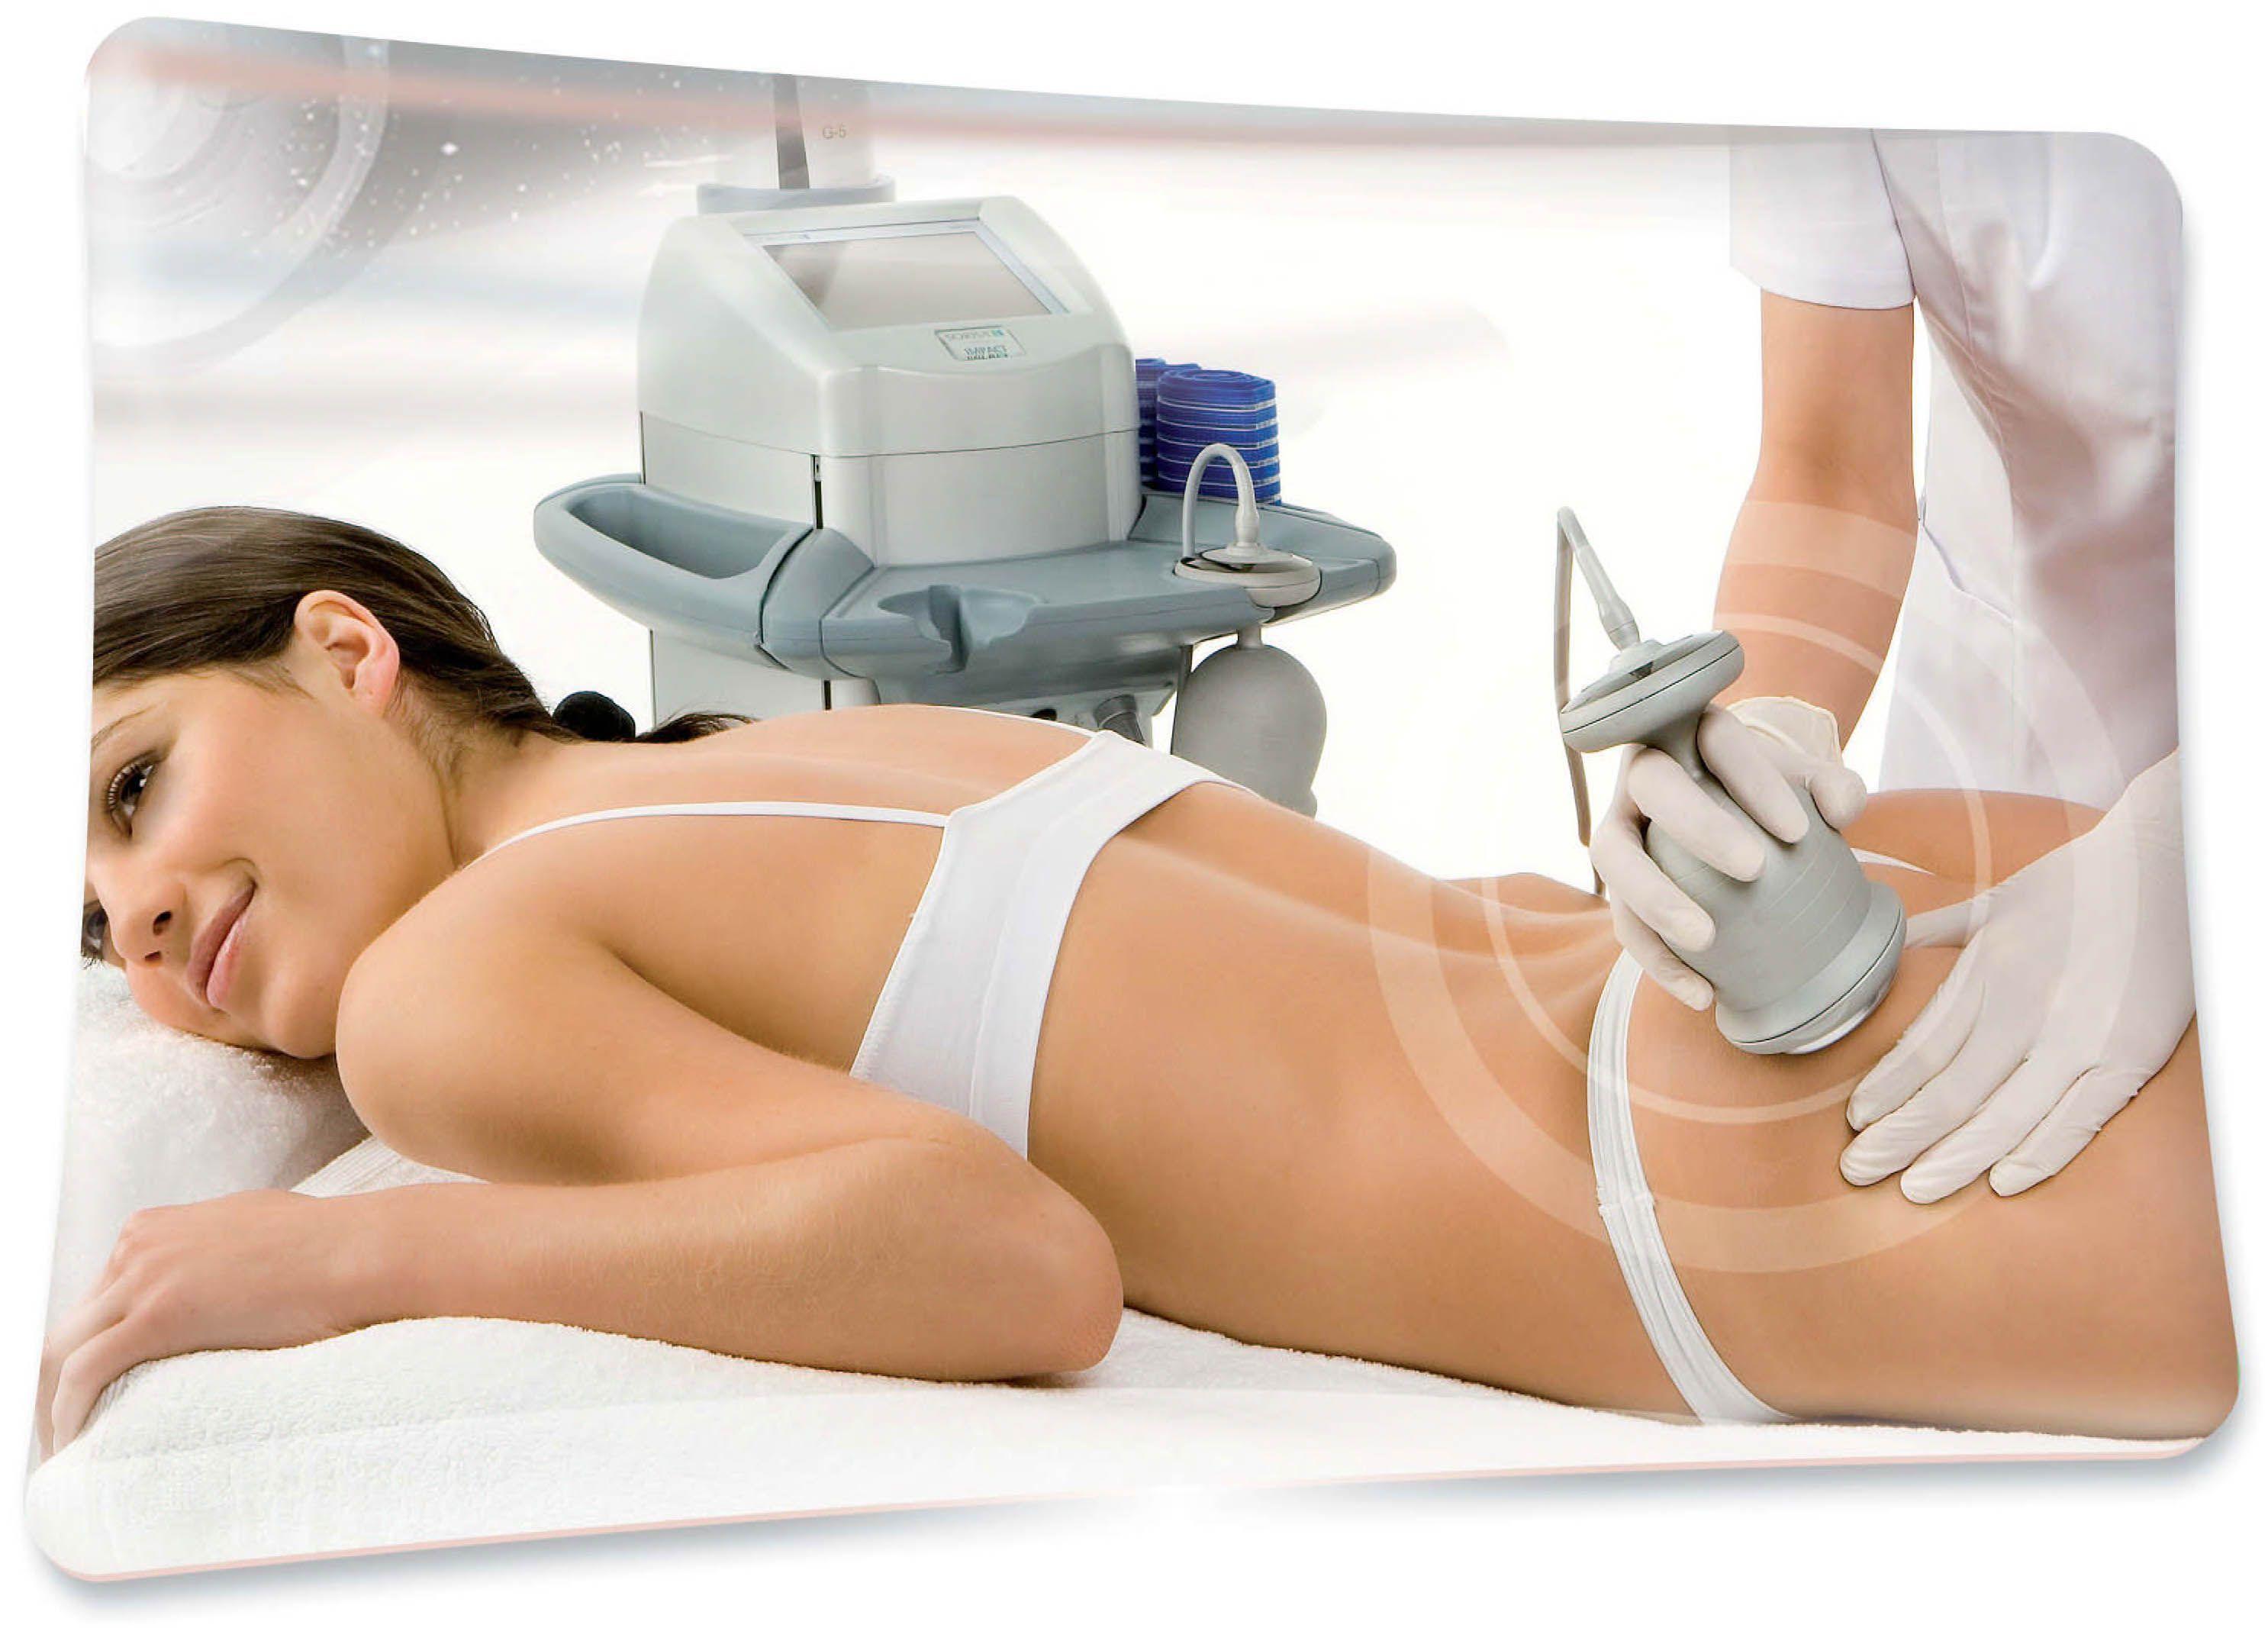 tratamiento estético corporal centro tándem